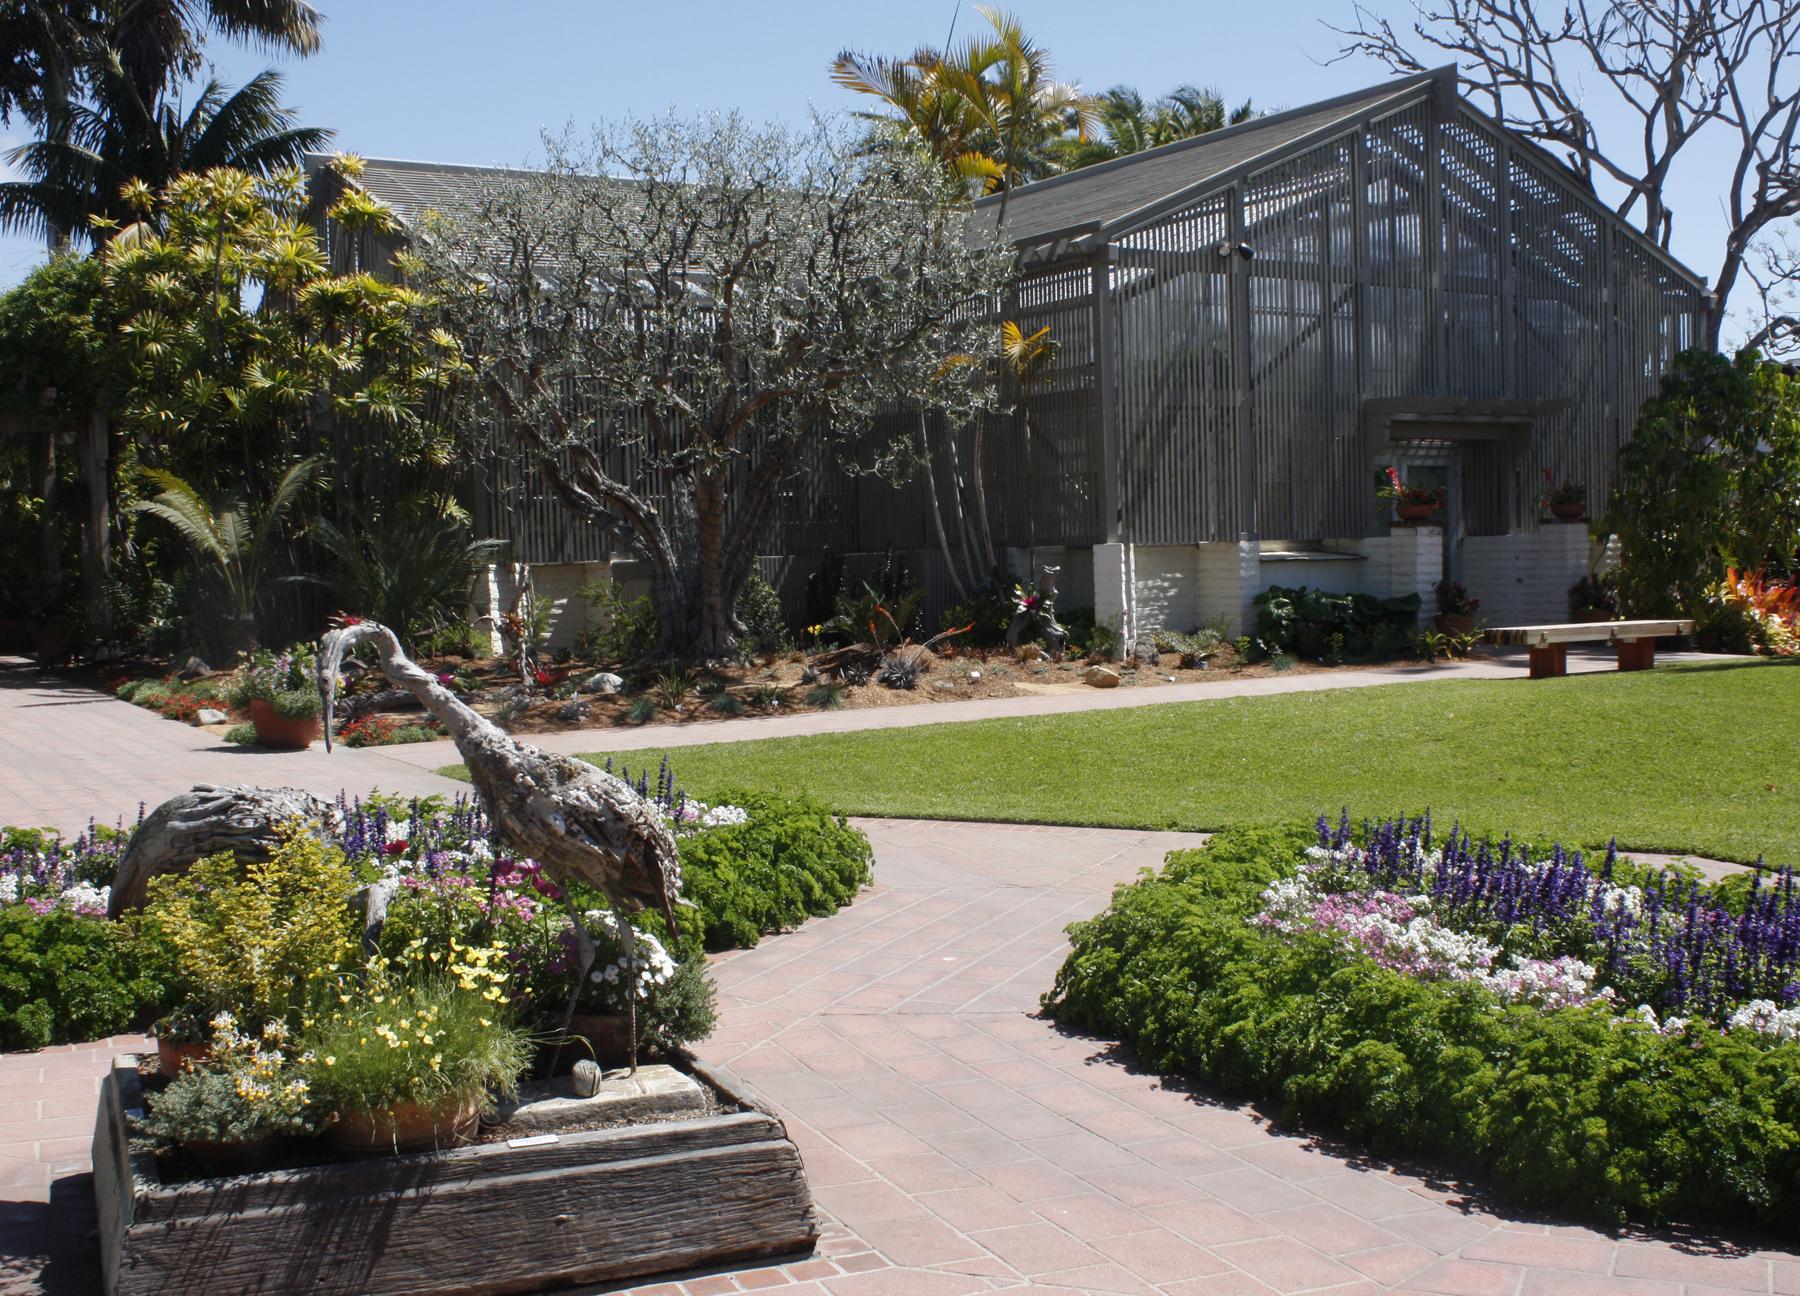 Newport Beach Local News Communities: A Tropical Trip to Sherman ...